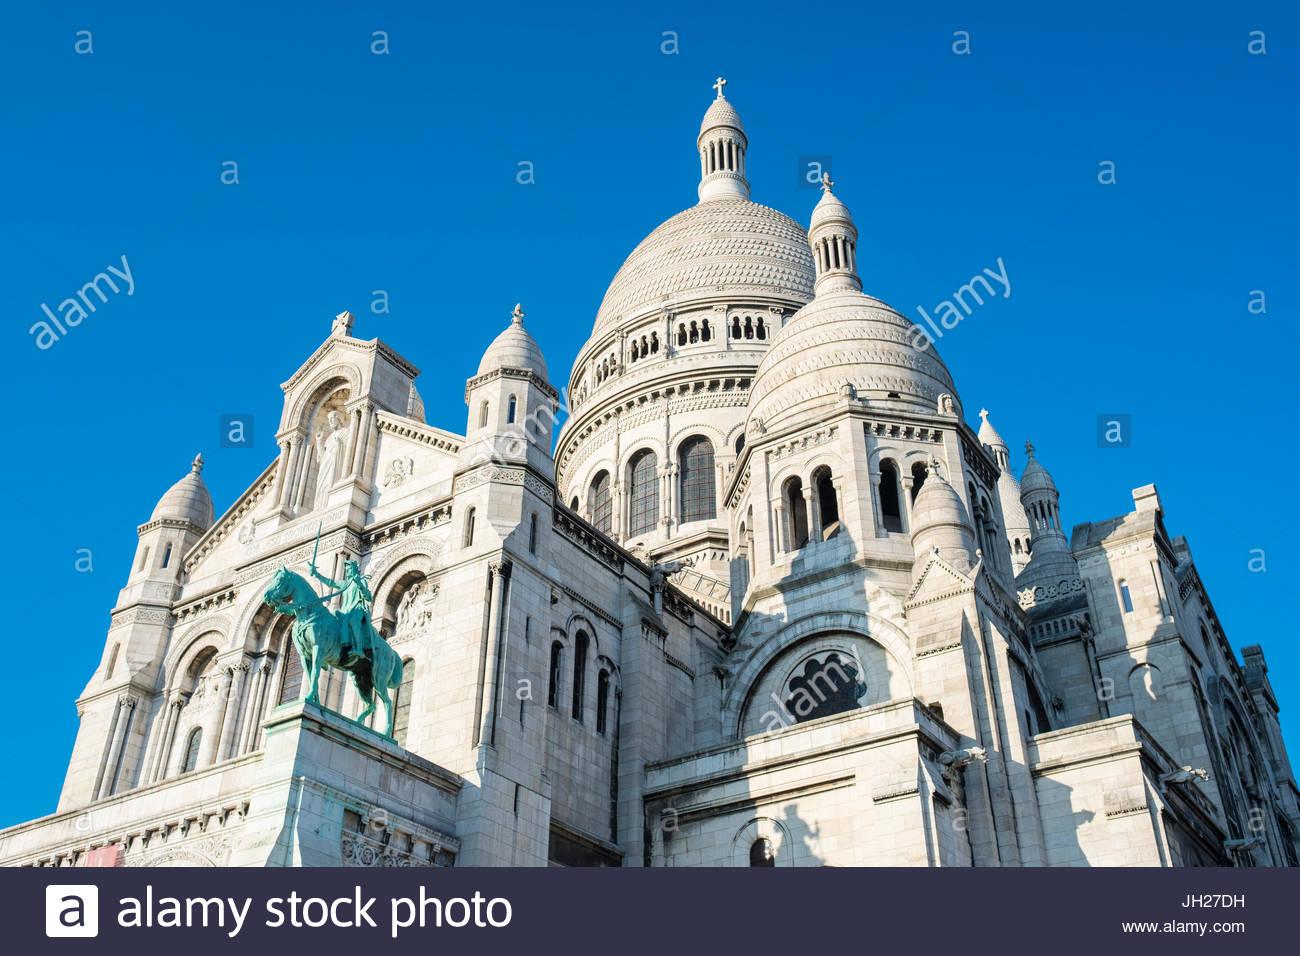 Basilika Sacre Coeur, Montmartre, Paris, Frankreich, Europa Stockbild